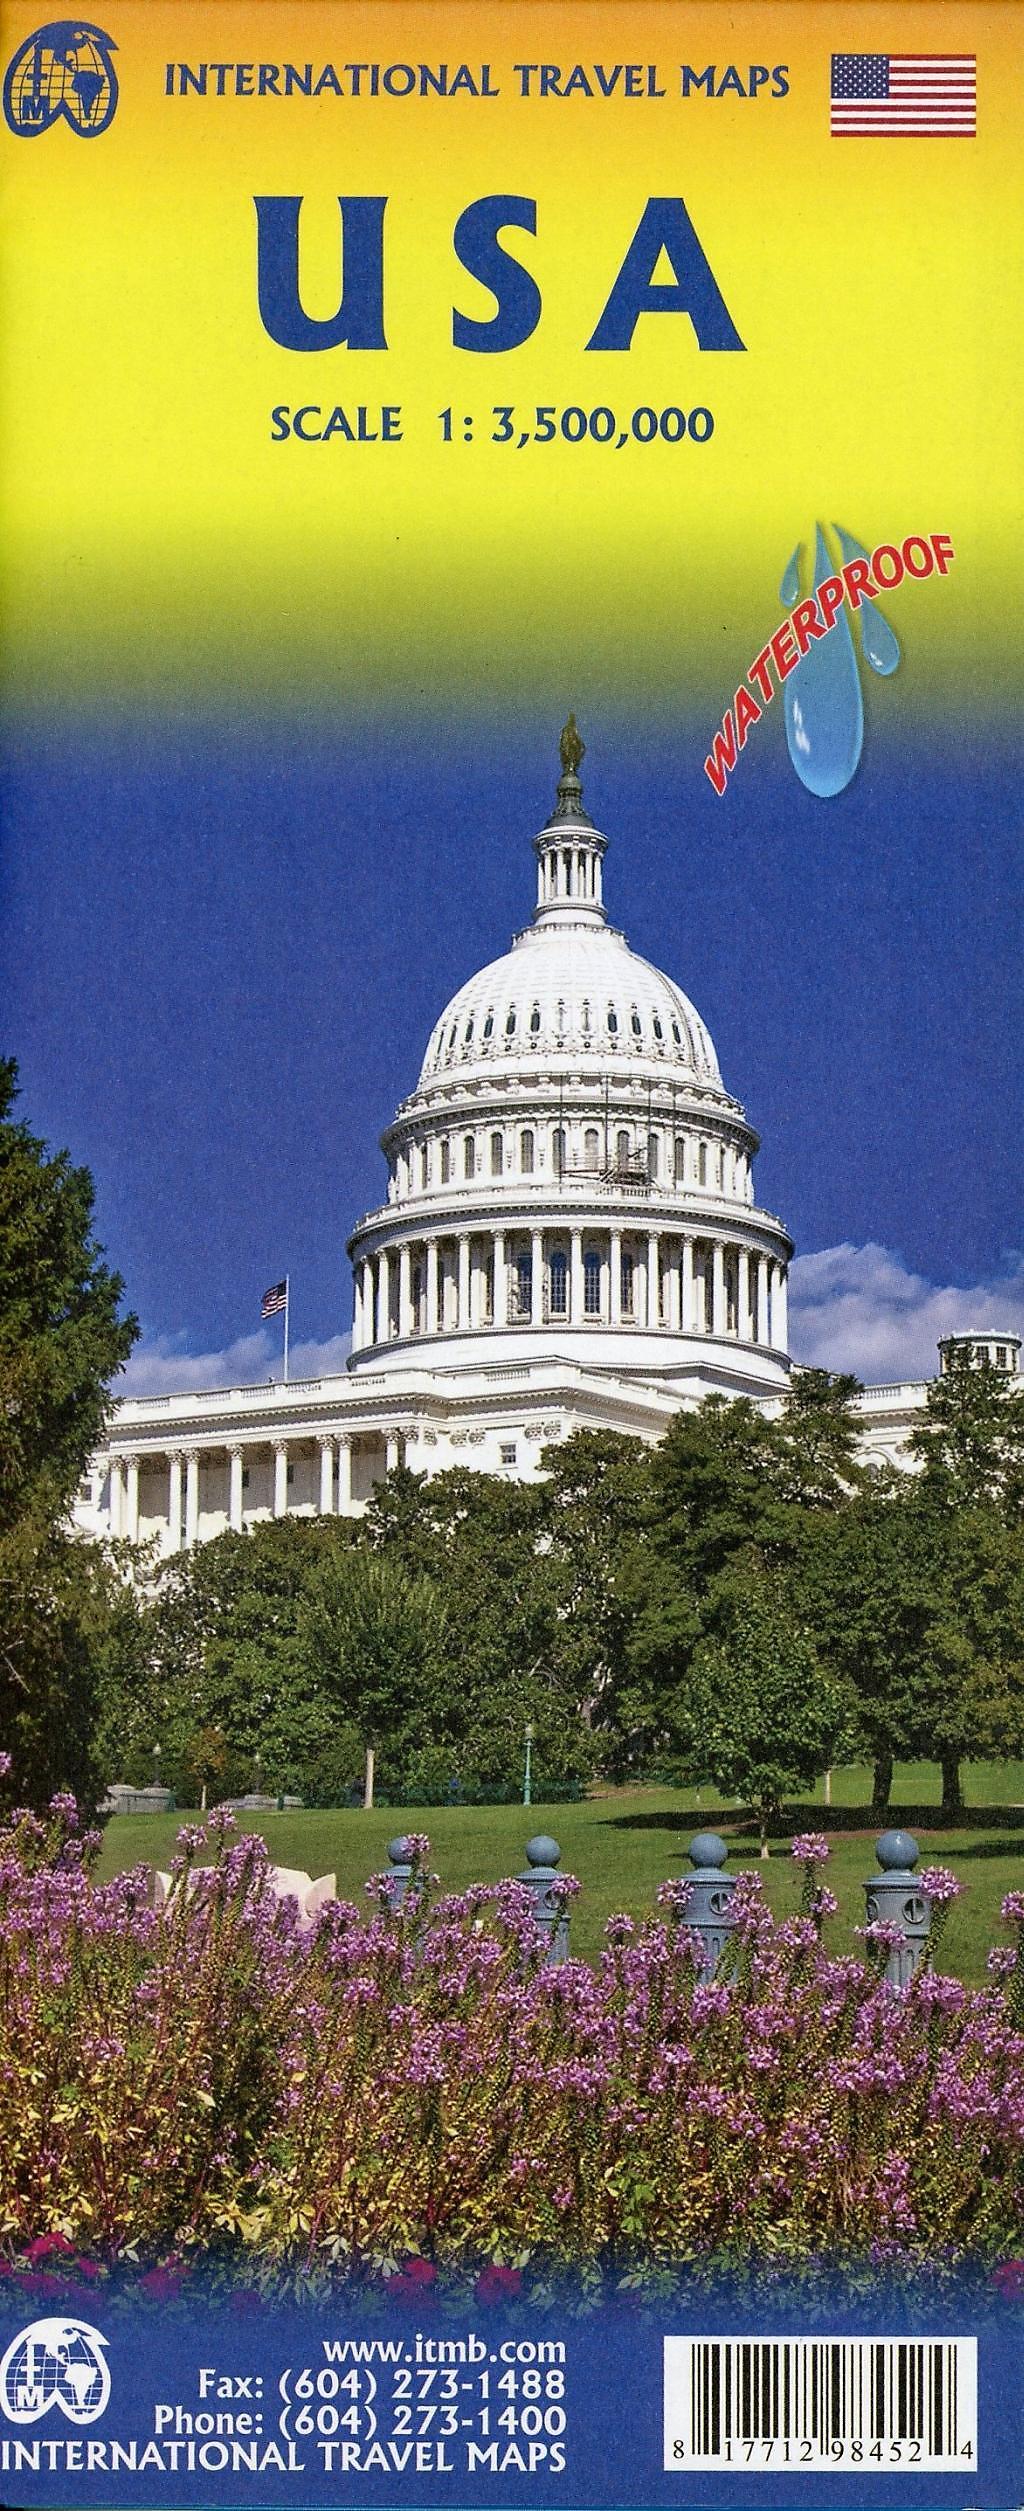 International Travel Map ITM Touristik Karte USA Buch portofrei